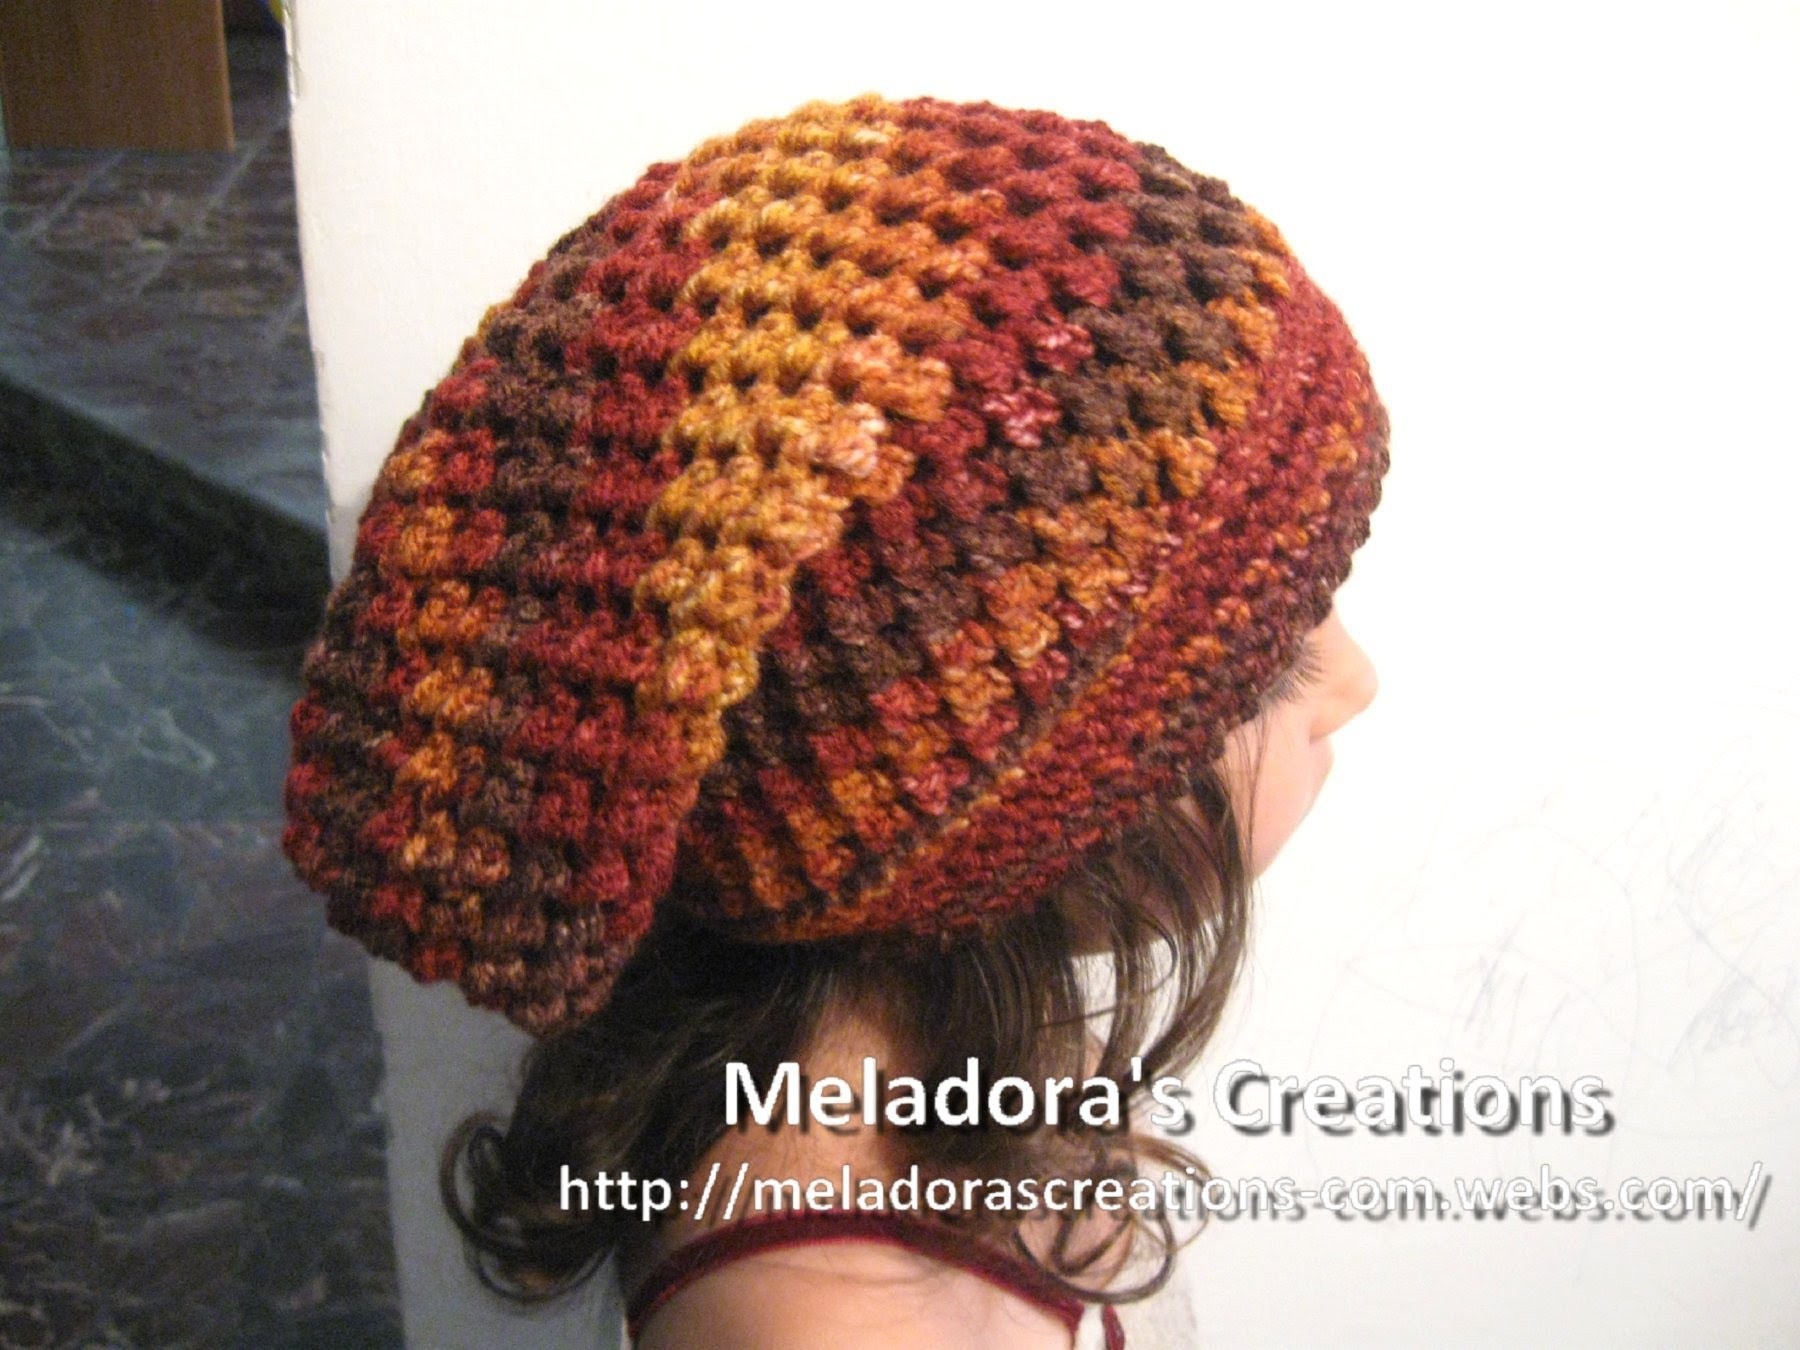 Butterfly Stitch Slouch Hat - Left Handed Verison - Crochet Tutorial